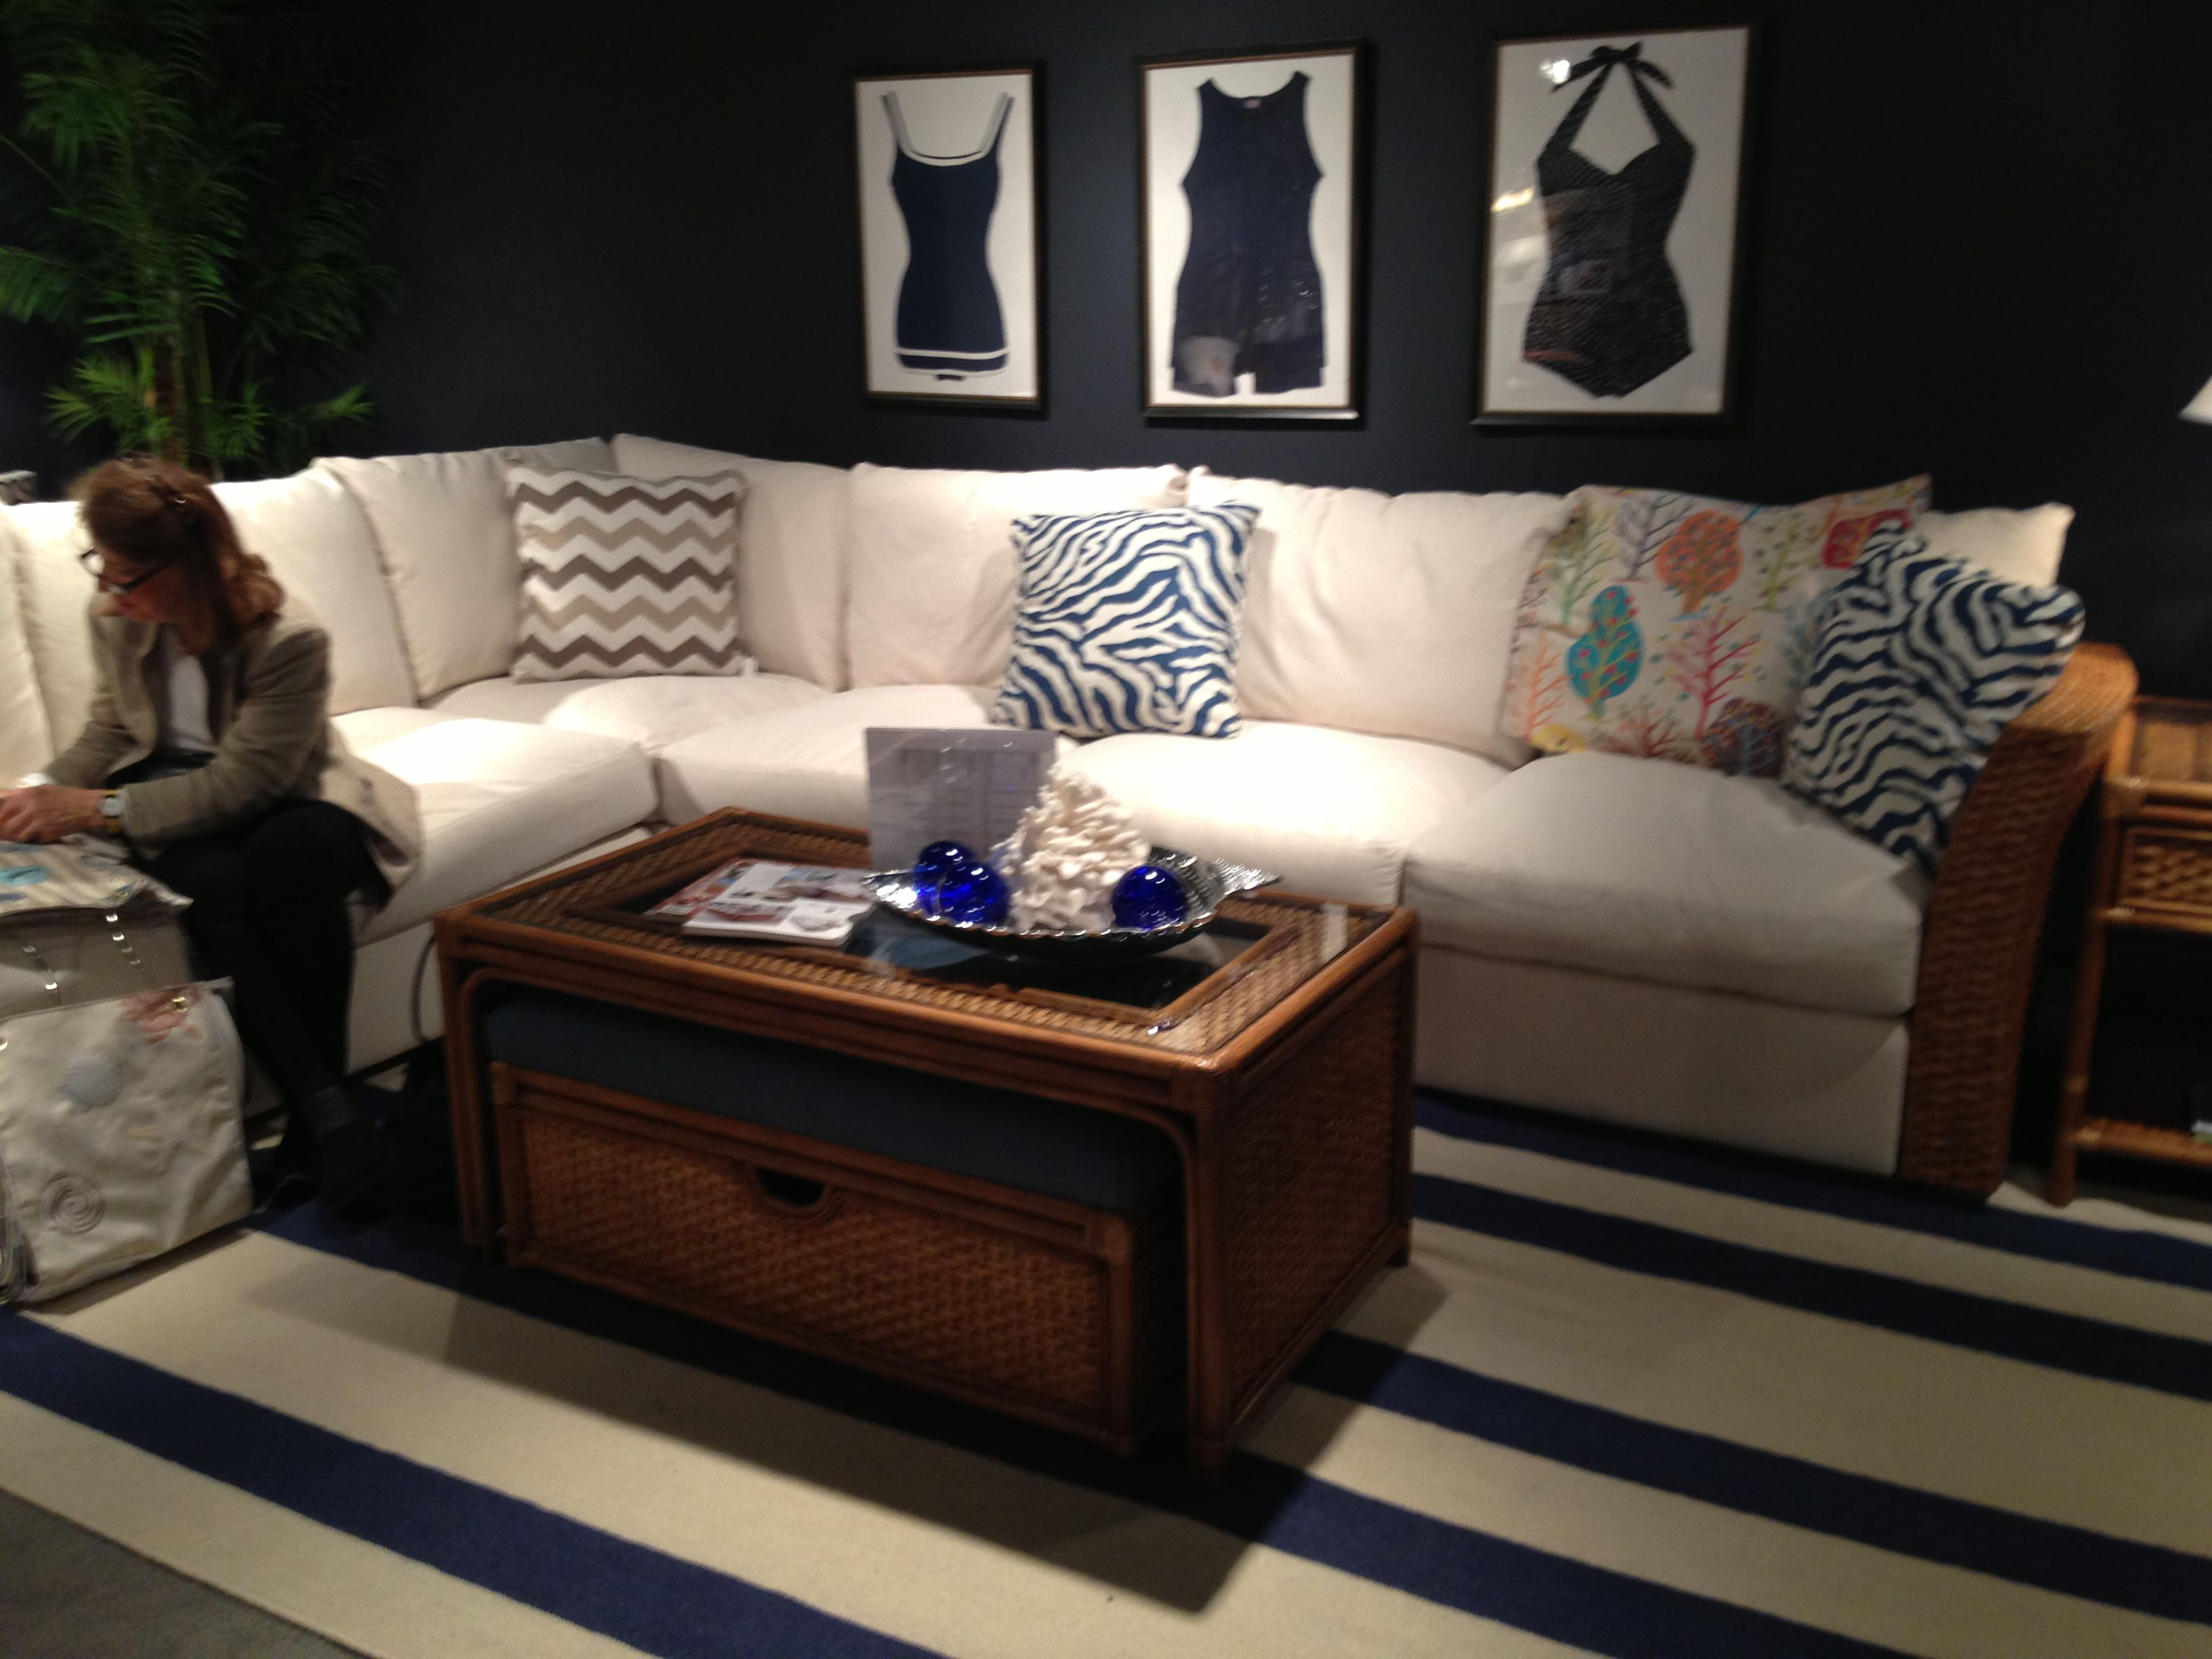 12 X 8 Sectional Sofa Custom Fabric Handmade In North Carolina